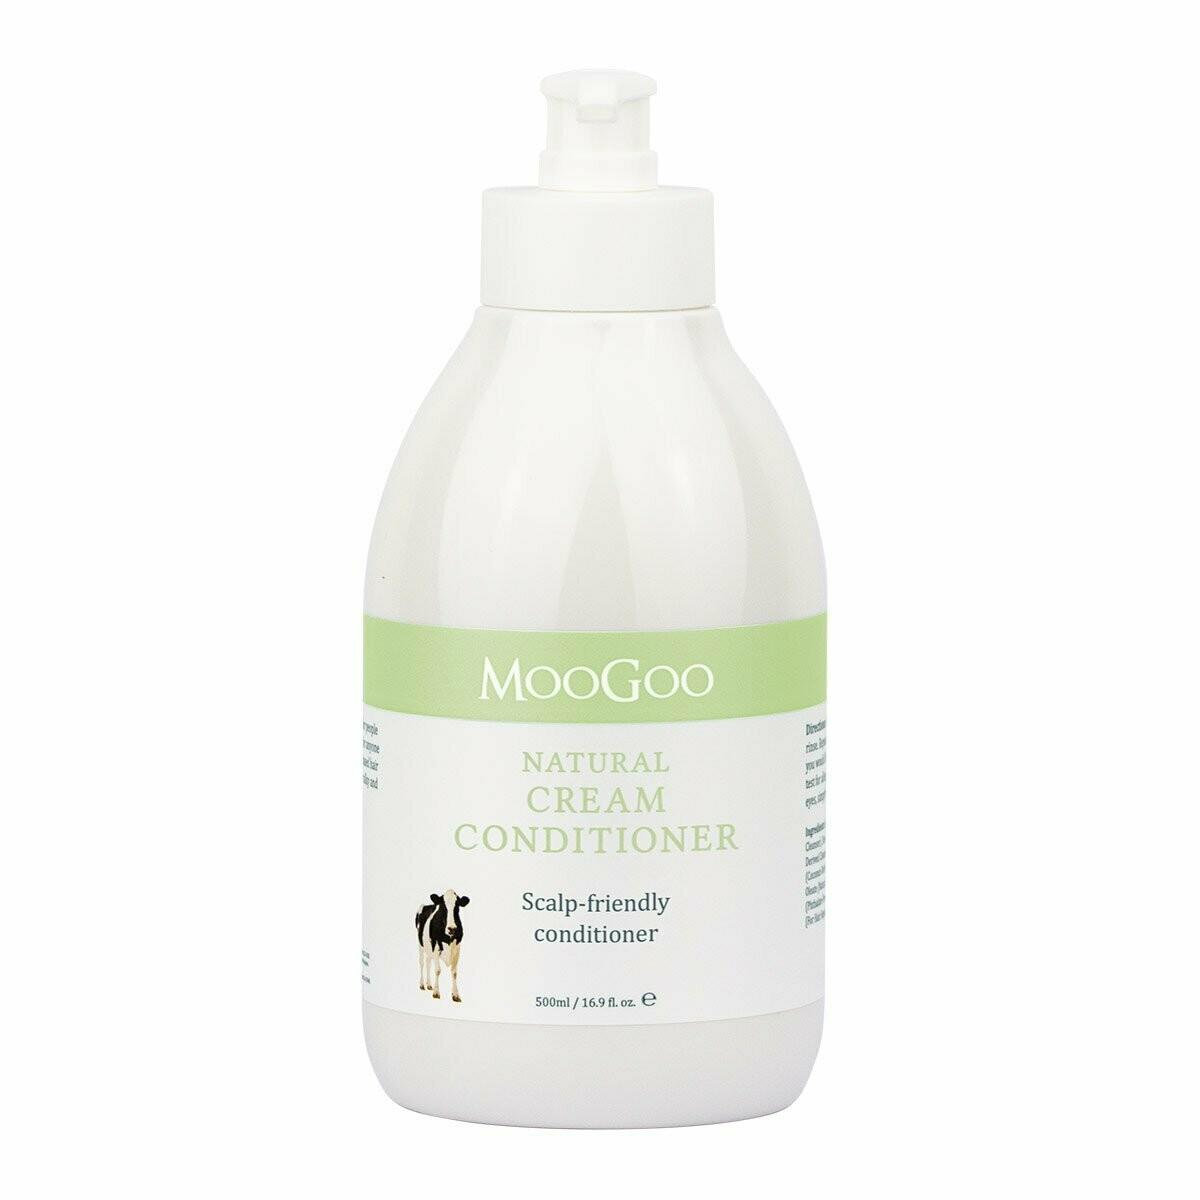 MooGoo Cream Conditioner